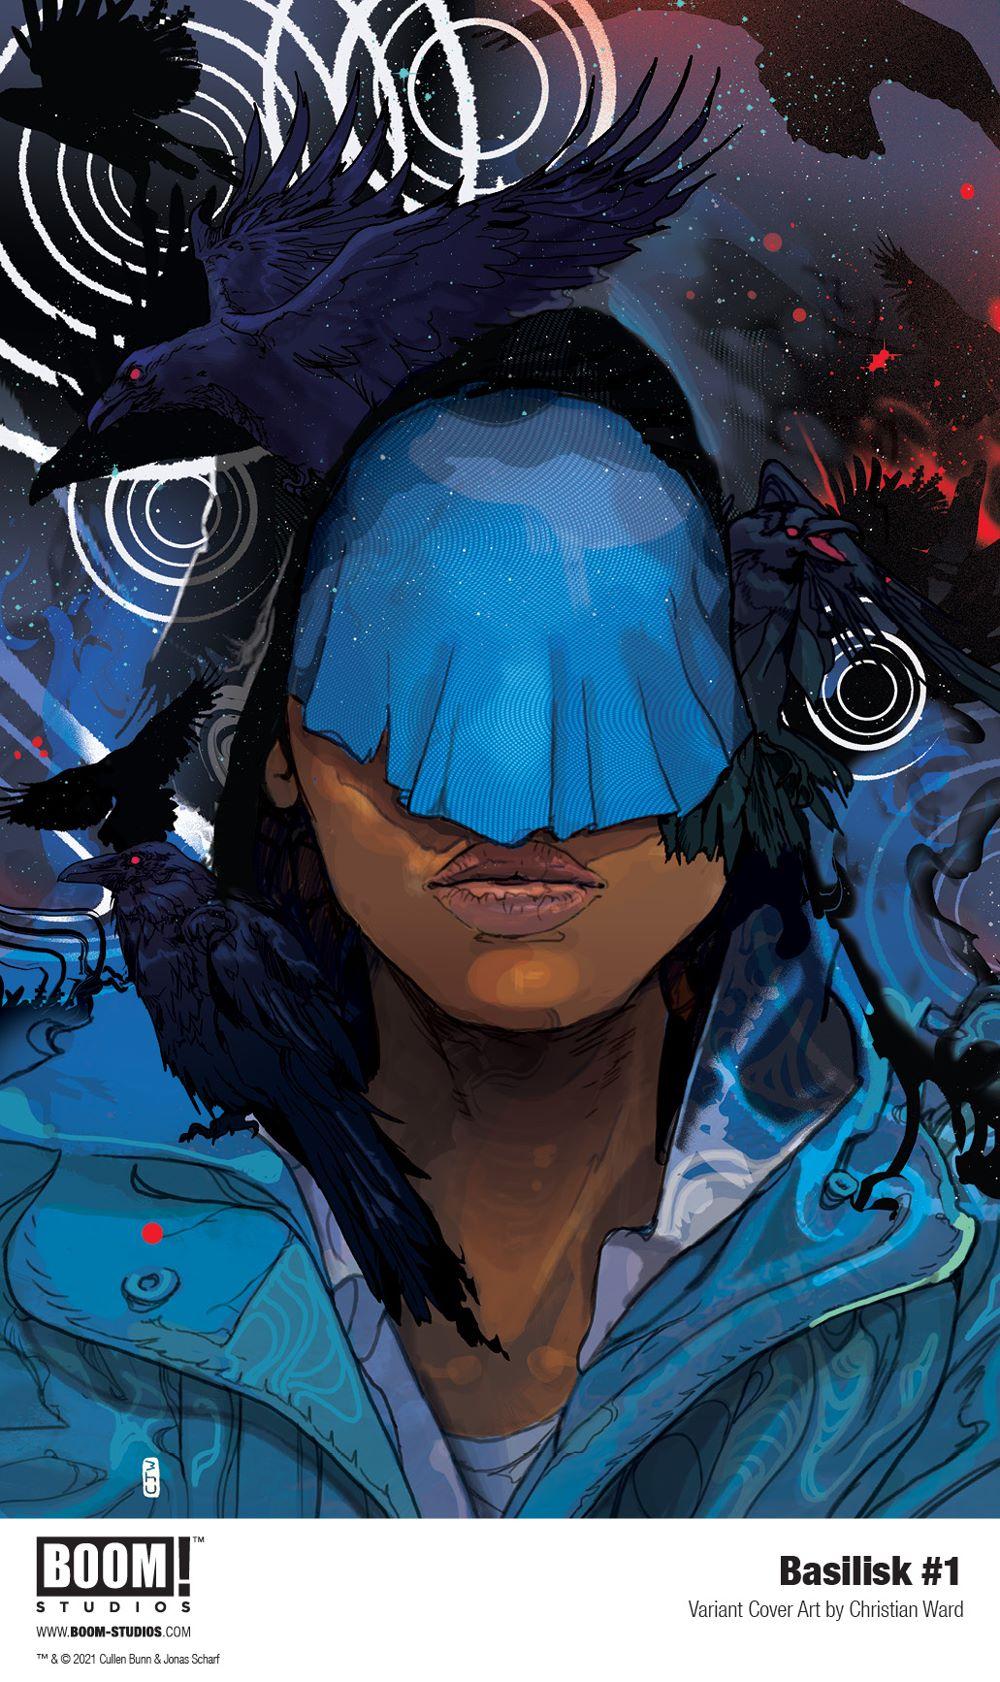 Basilisk_001_Cover_Variant_Ward_PROMO Mortal enemies and mythology mix in BASILISK